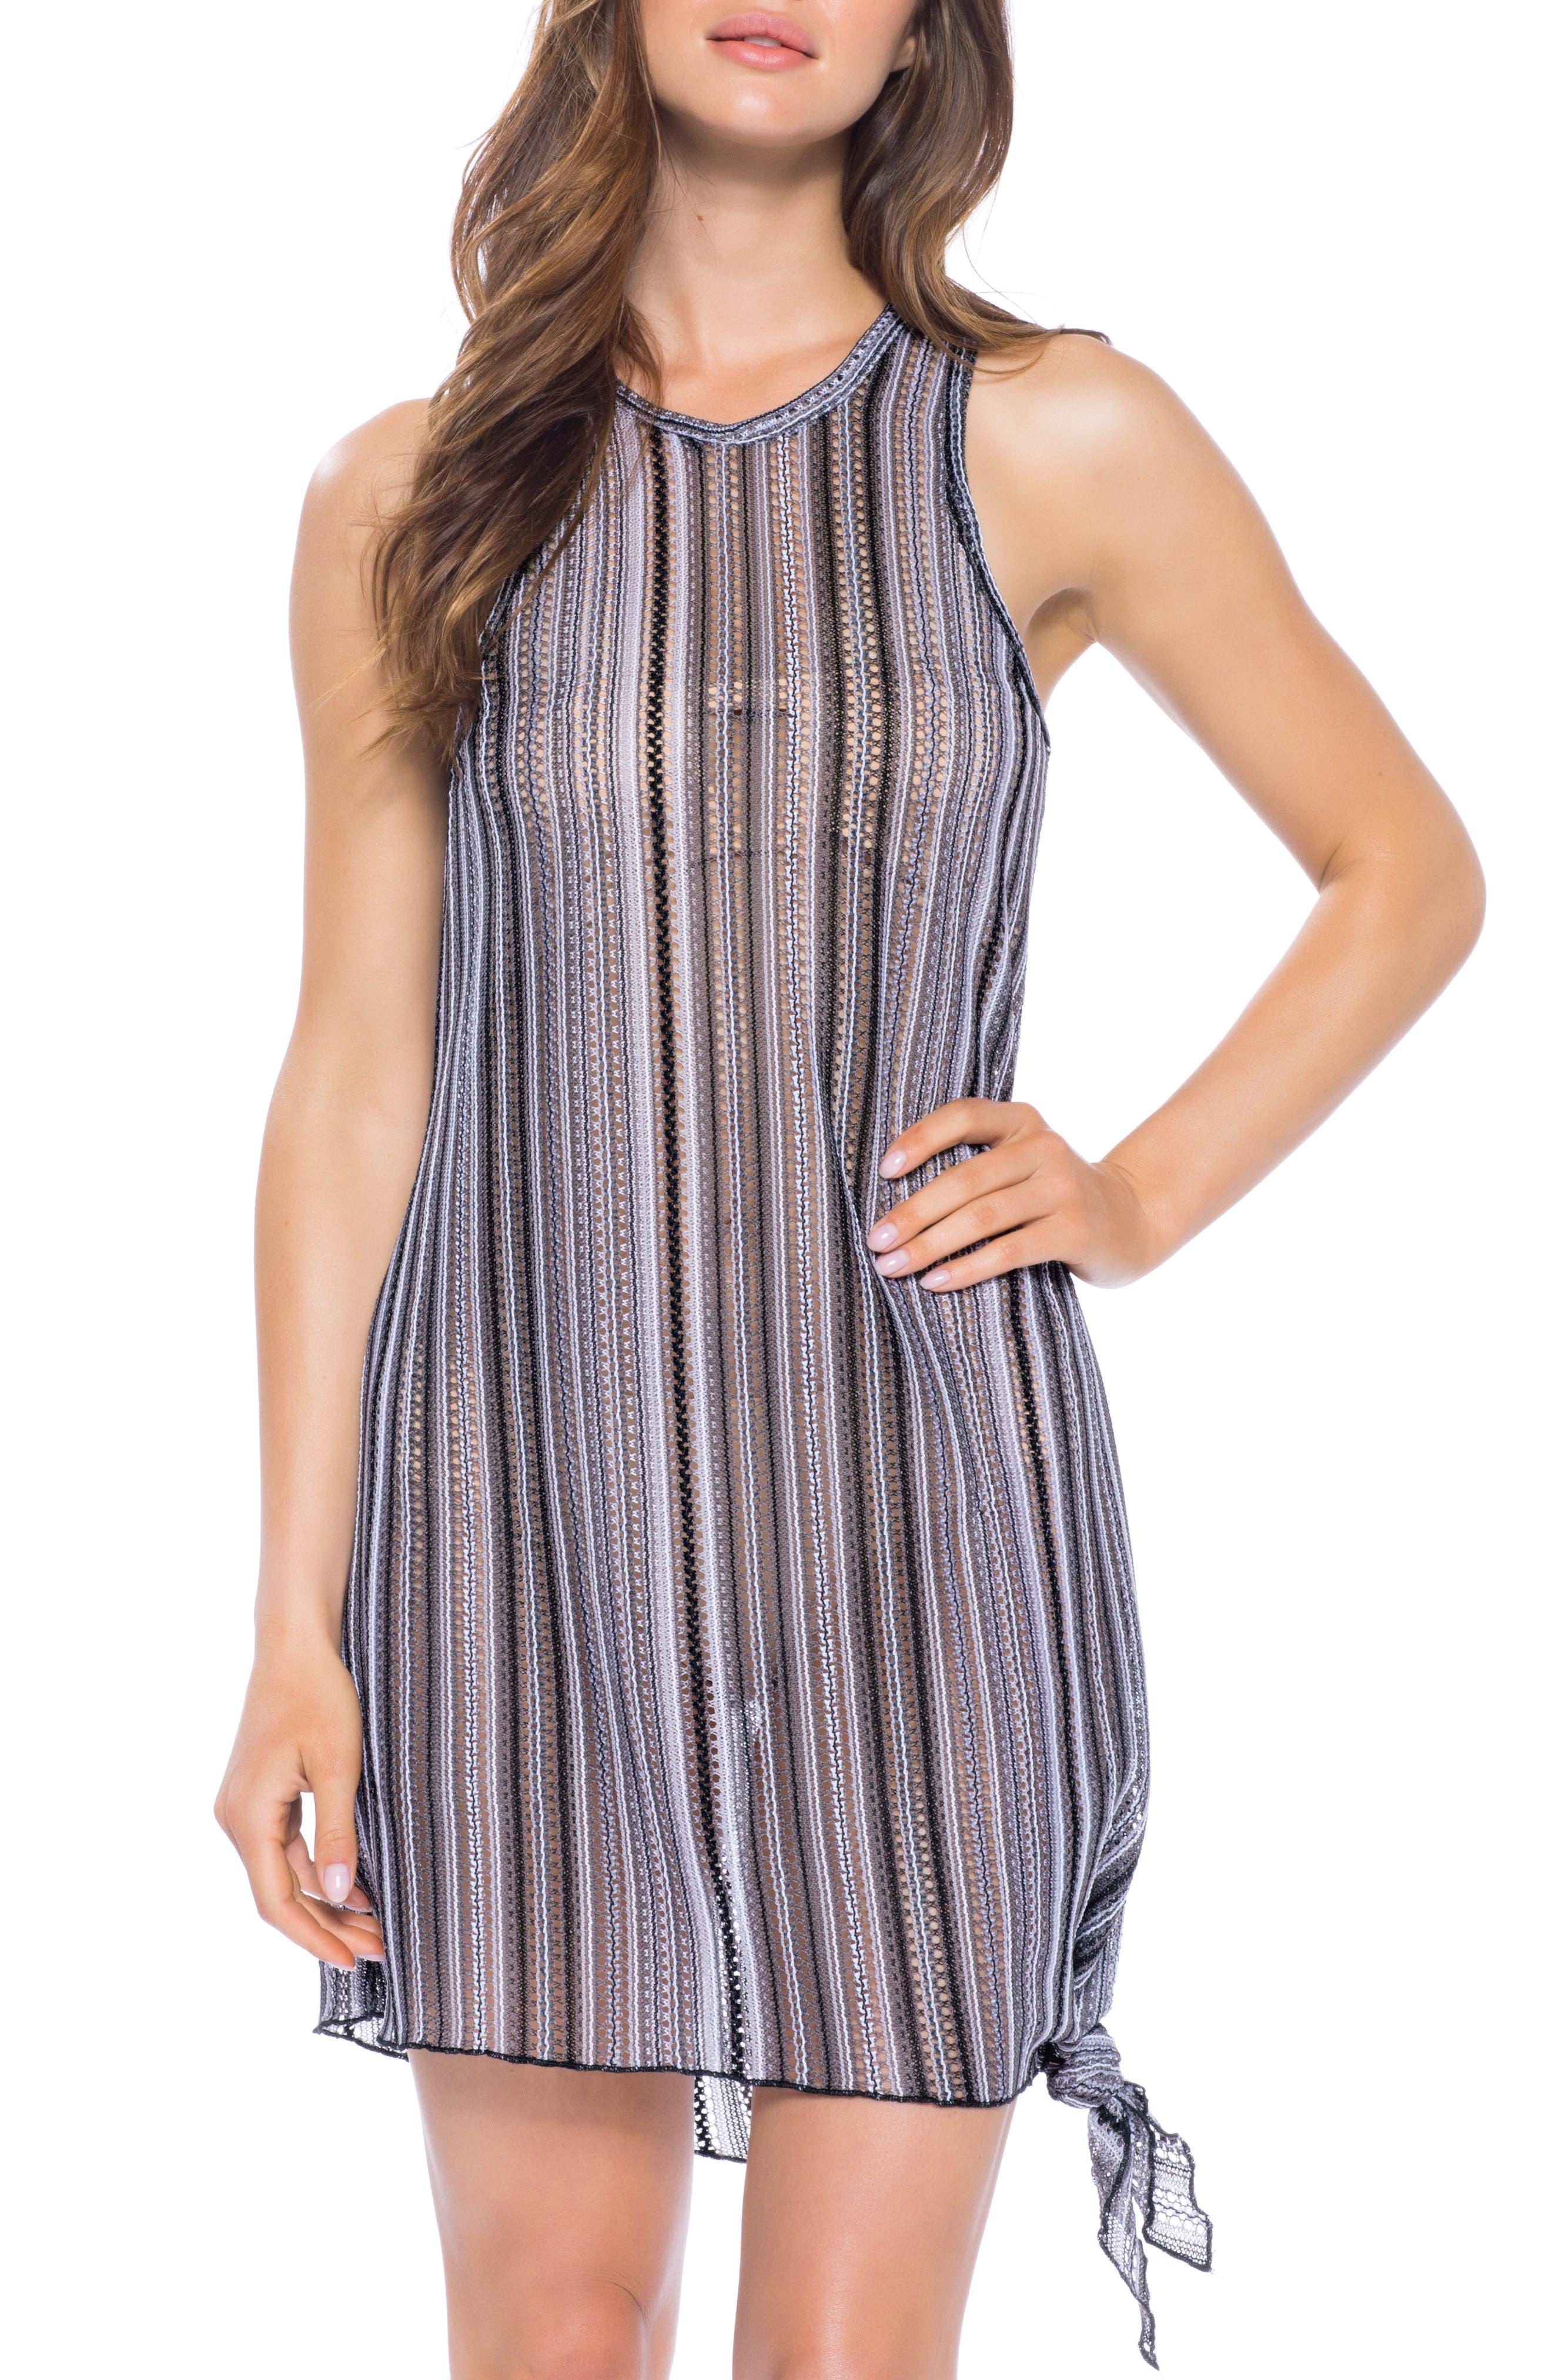 Becca Pierside Knot Cover-Up Dress, Black